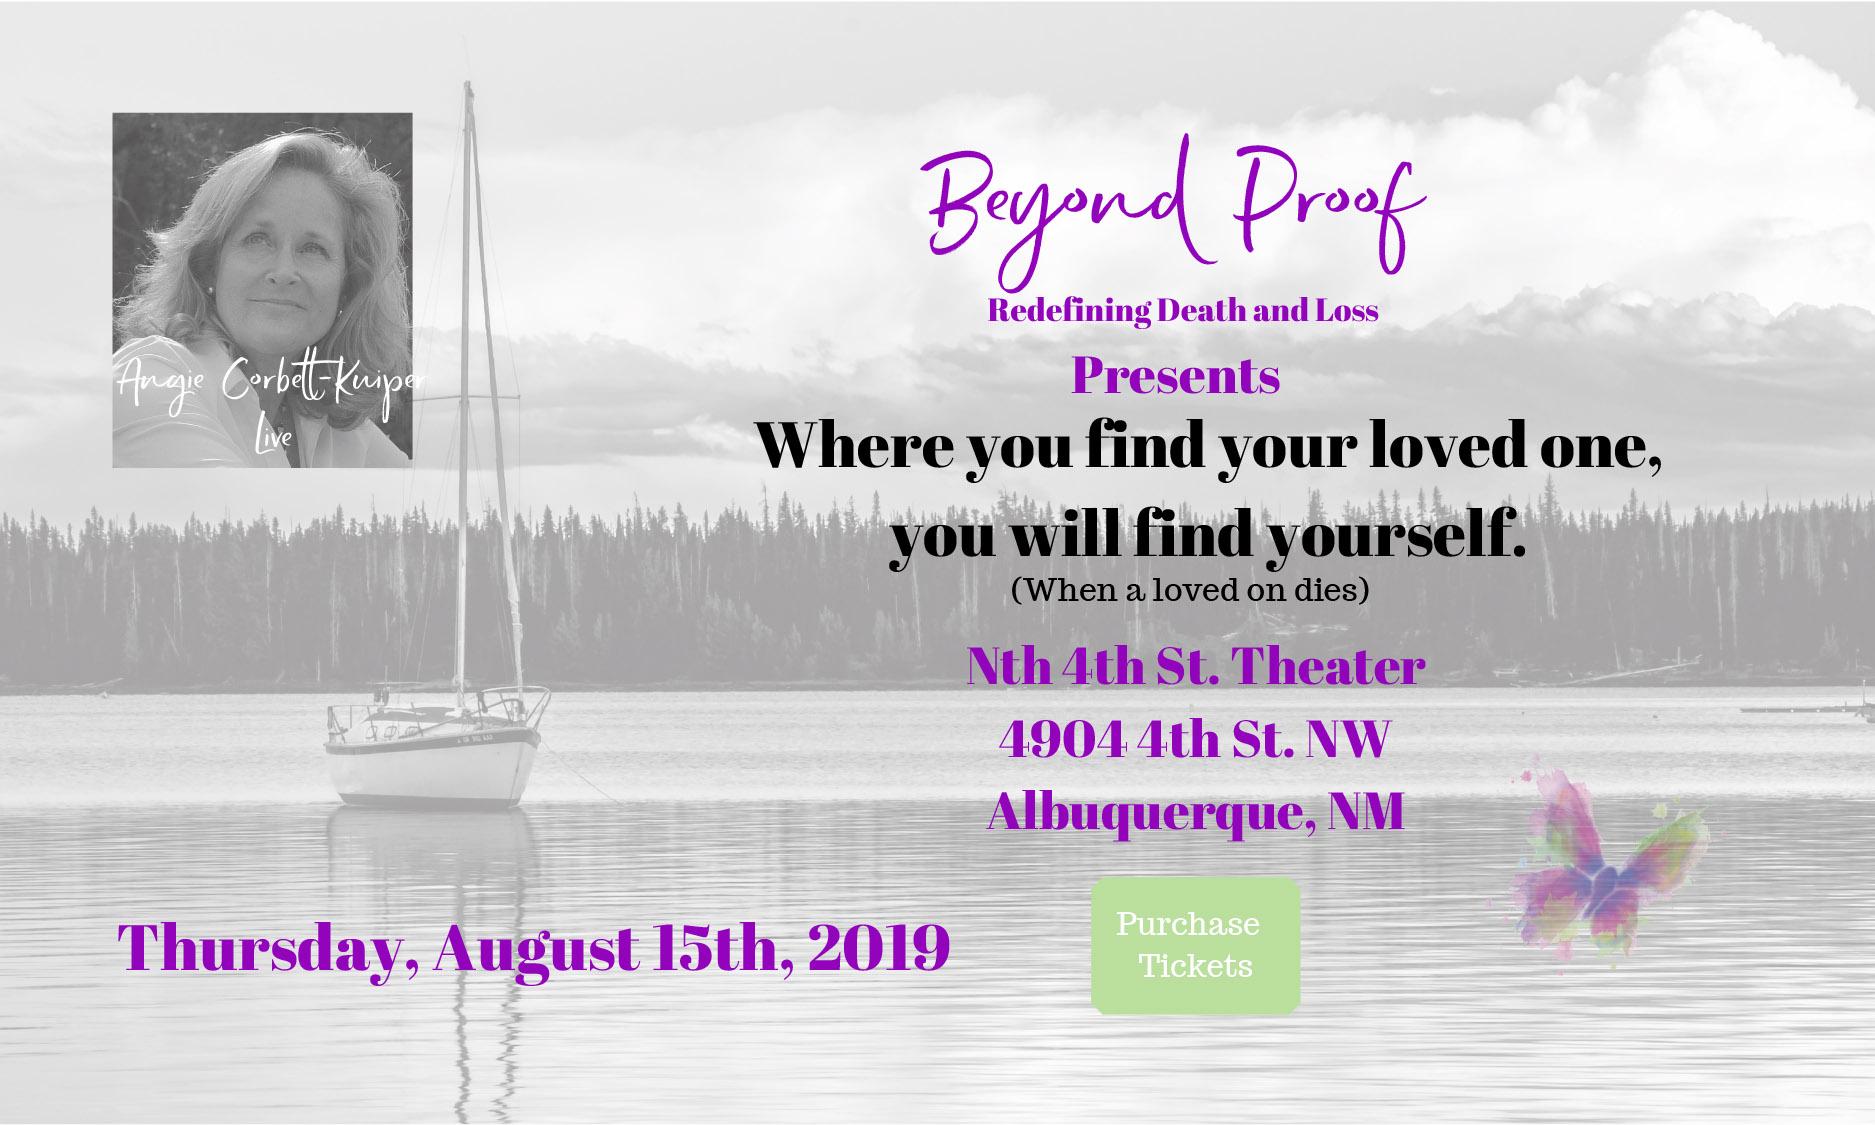 Angie Corbett-Kuiper — Beyond Proof — August 15 event